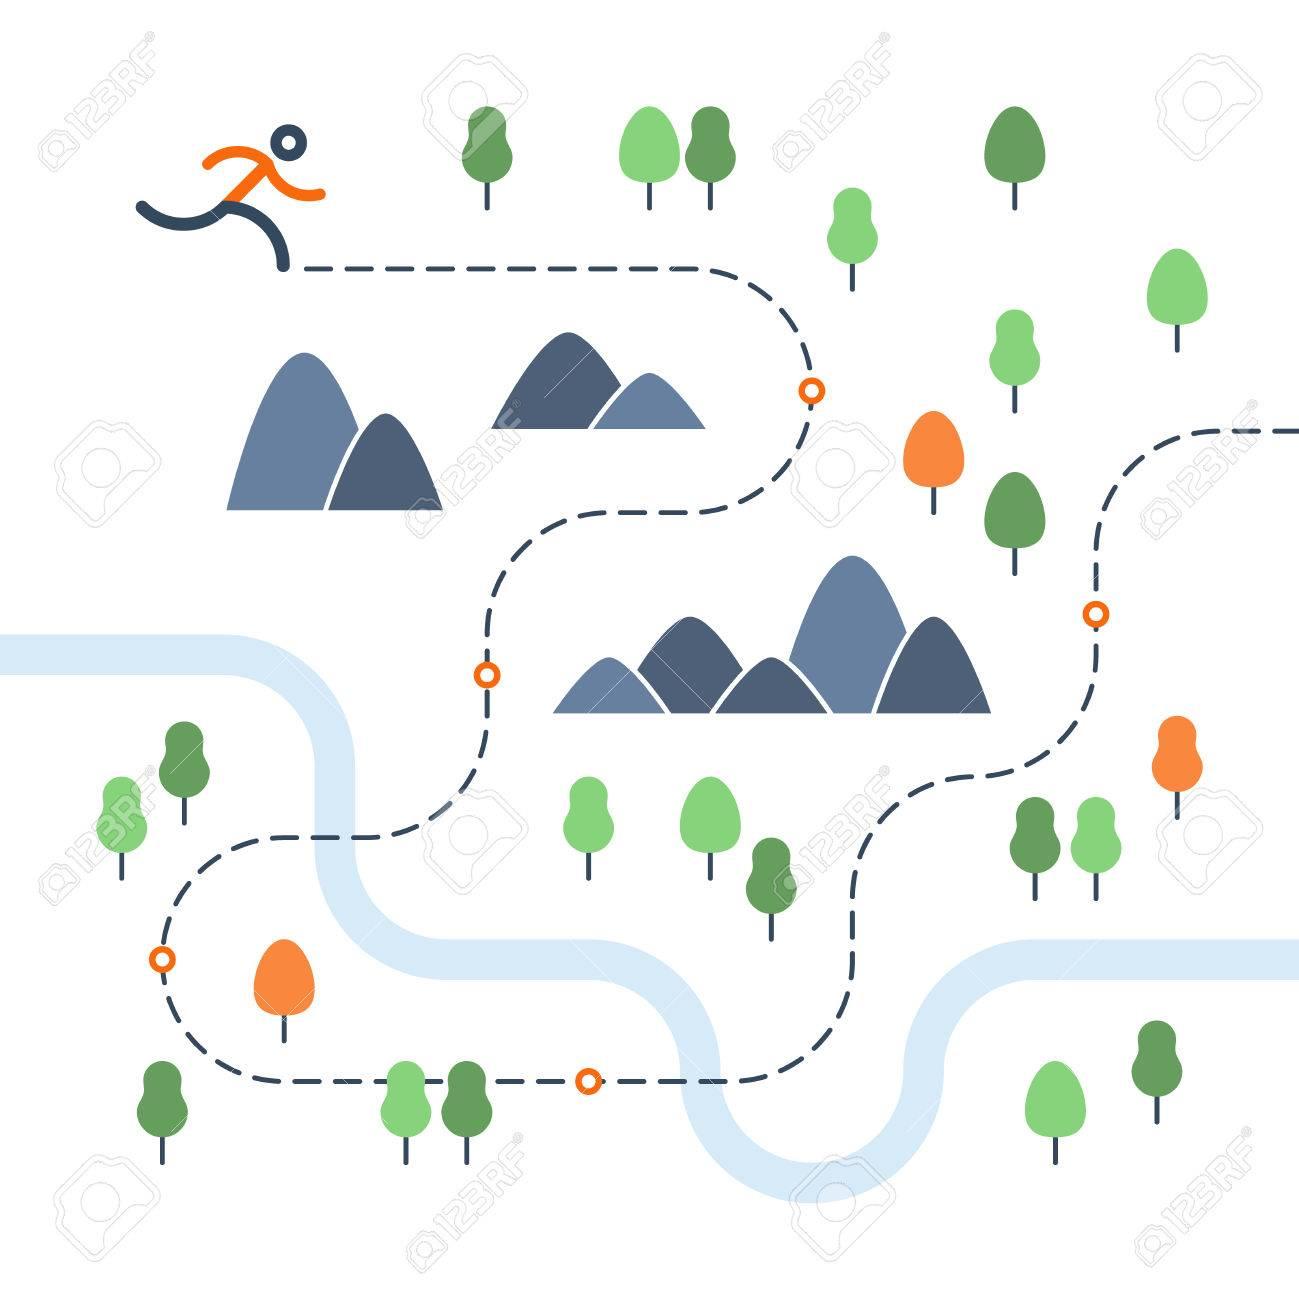 Outdoor running map - 53496600